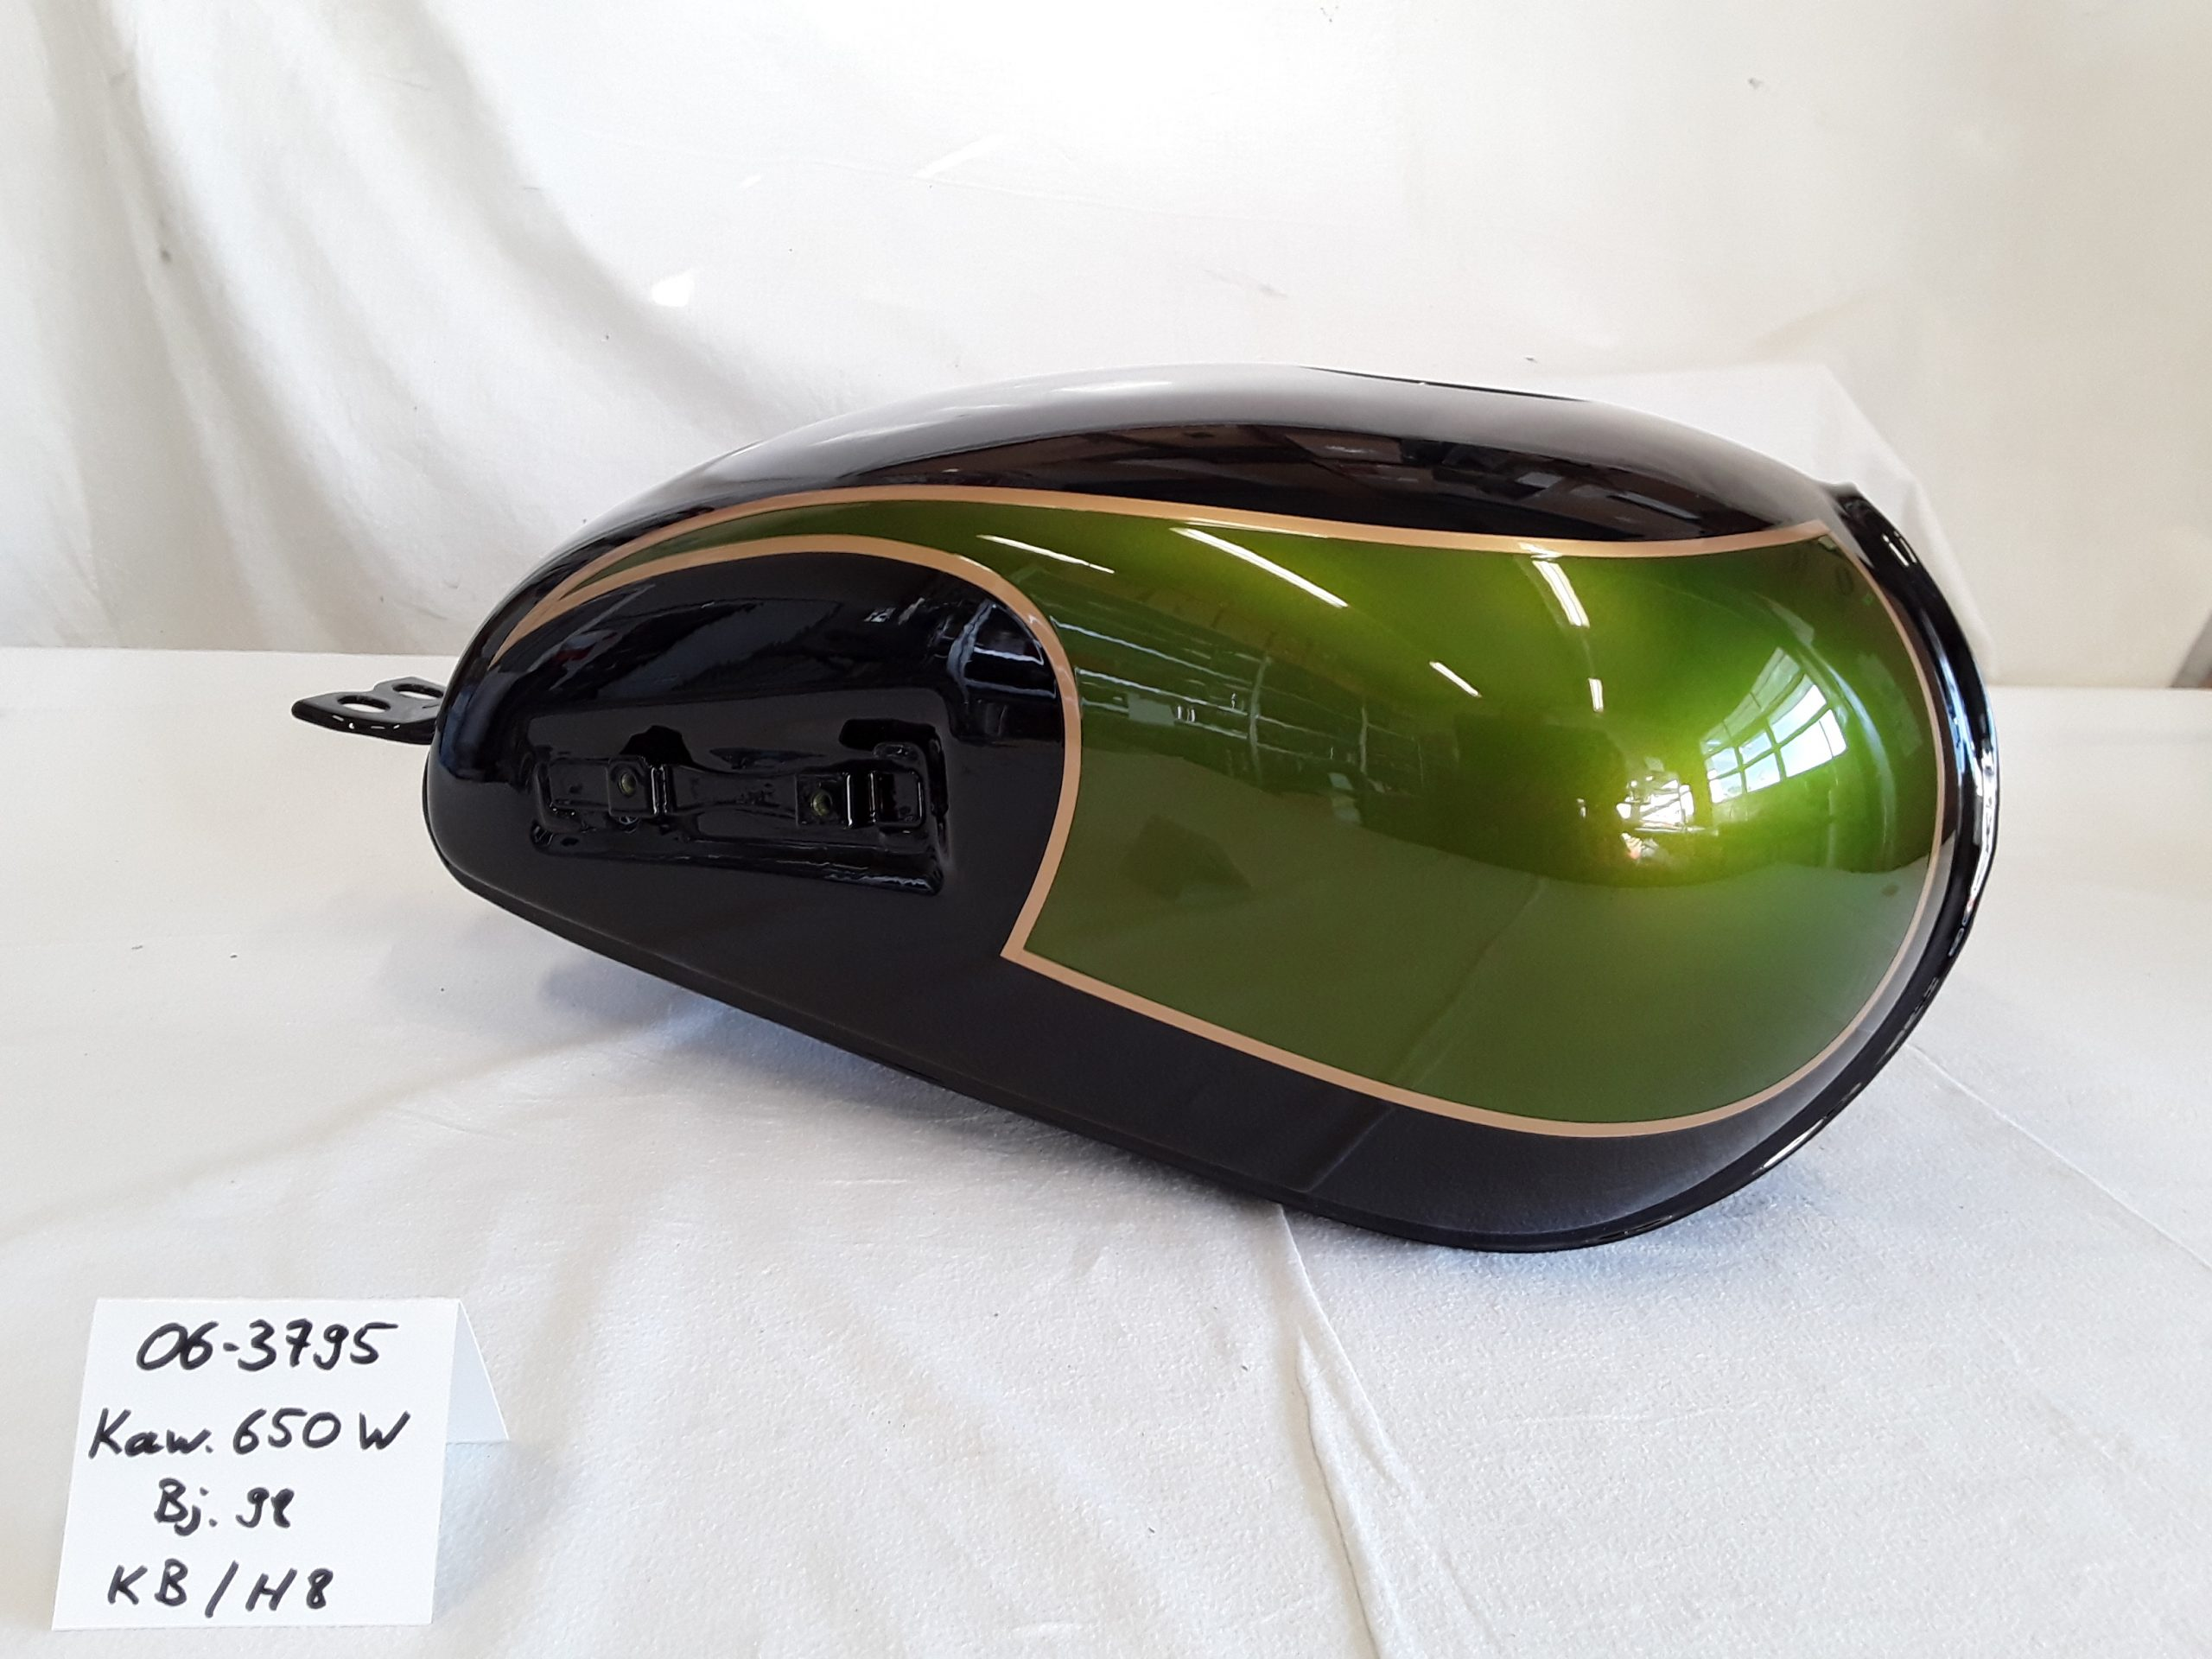 Kawasaki W650 Bj.1998 in candy jade green/KB und ebony /H8 RH-Lacke Lackiererei Motorradlackierung